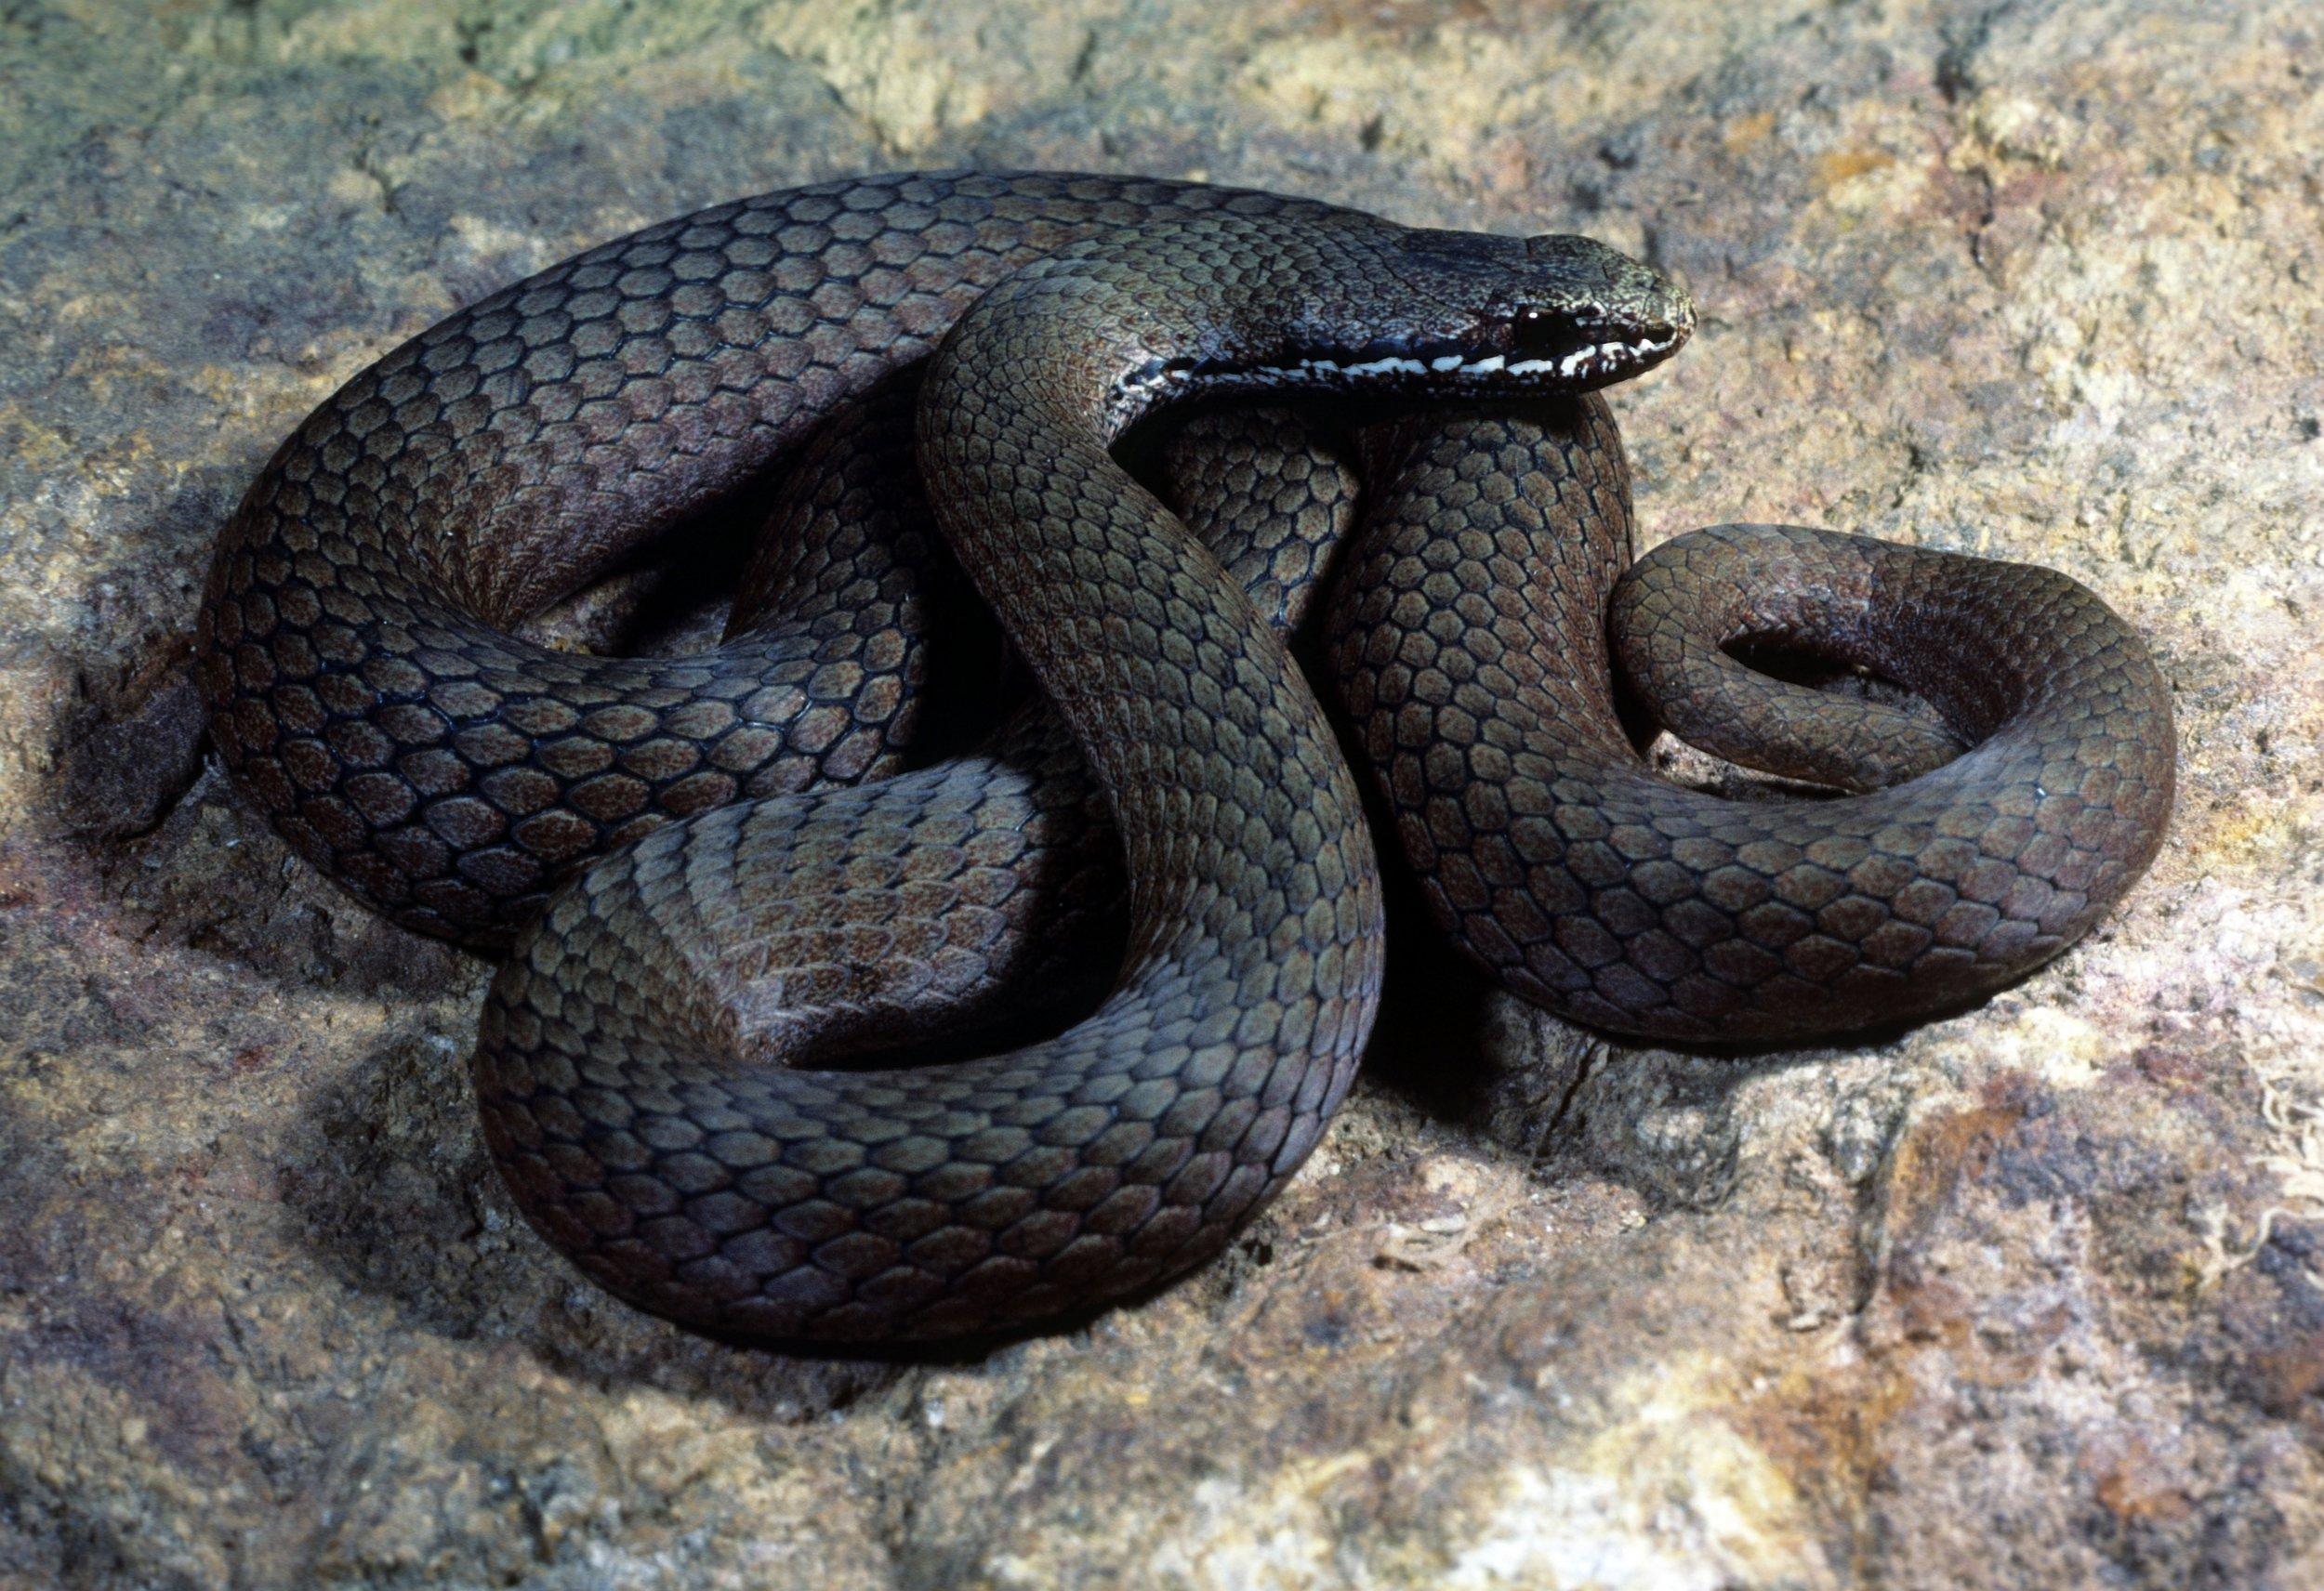 Thousand Lakes Lodge - white lipped snake